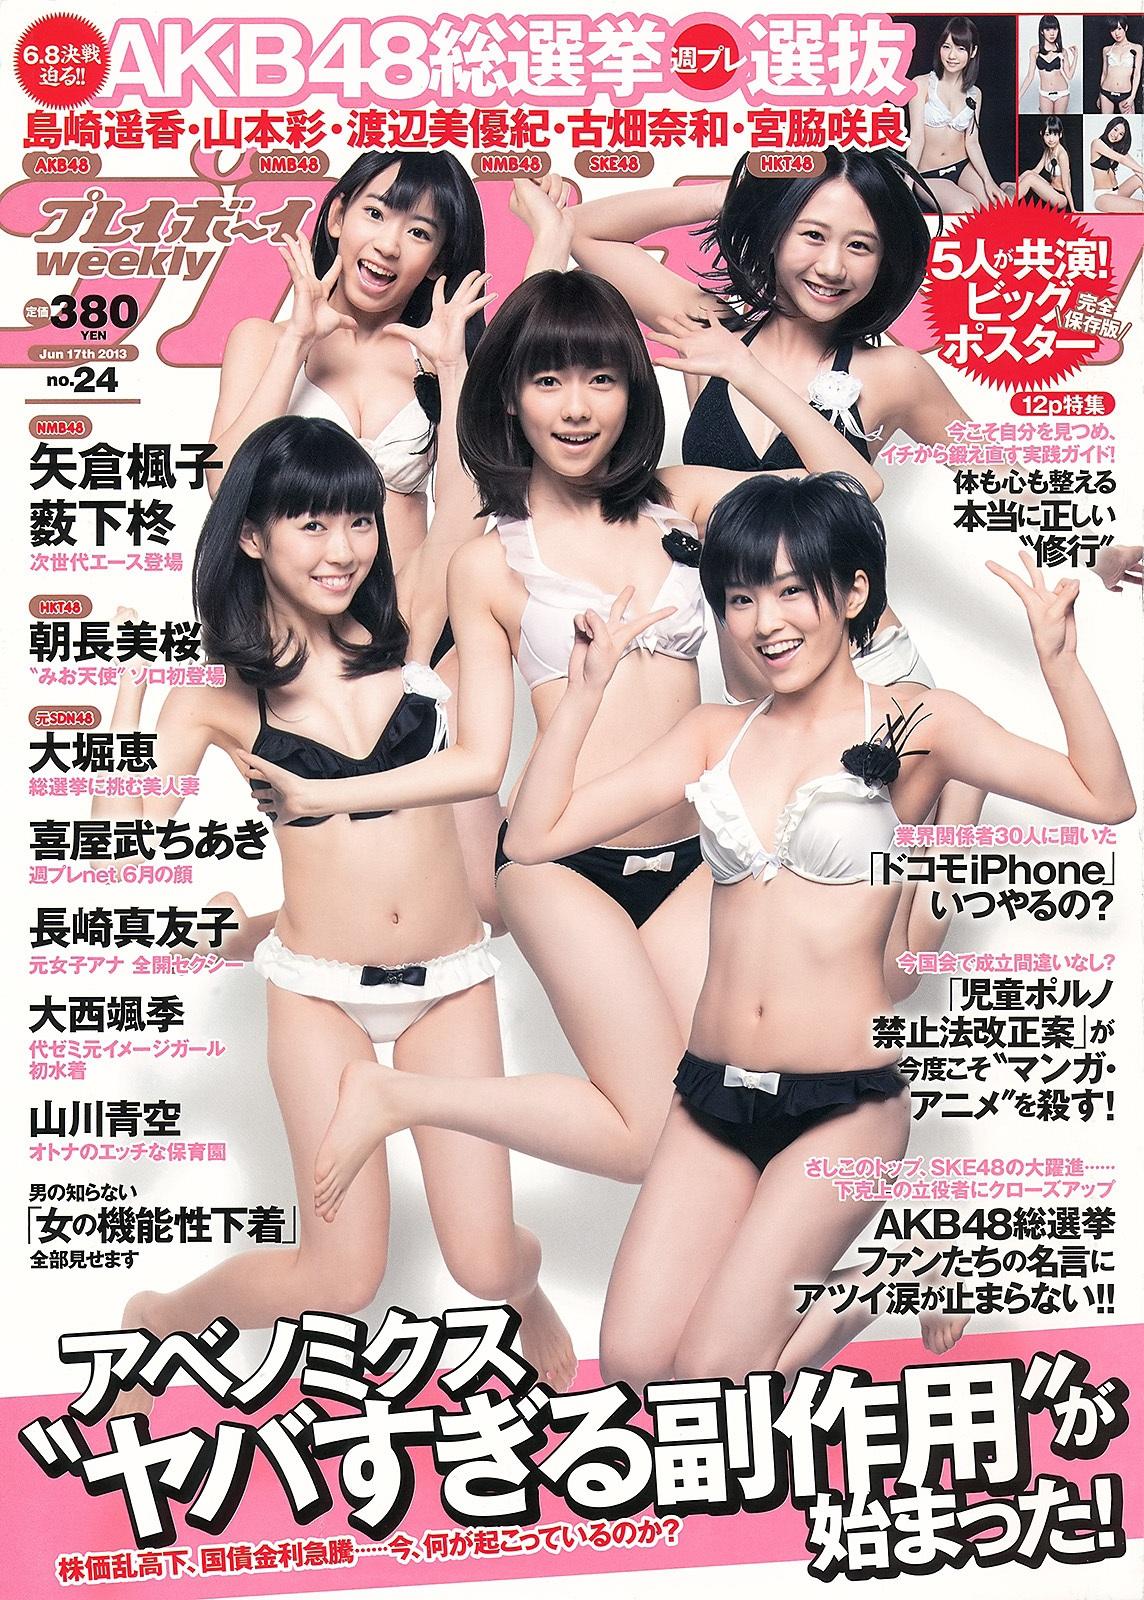 AKB48 Weekly Playboy 週刊プレイボーイ June cover